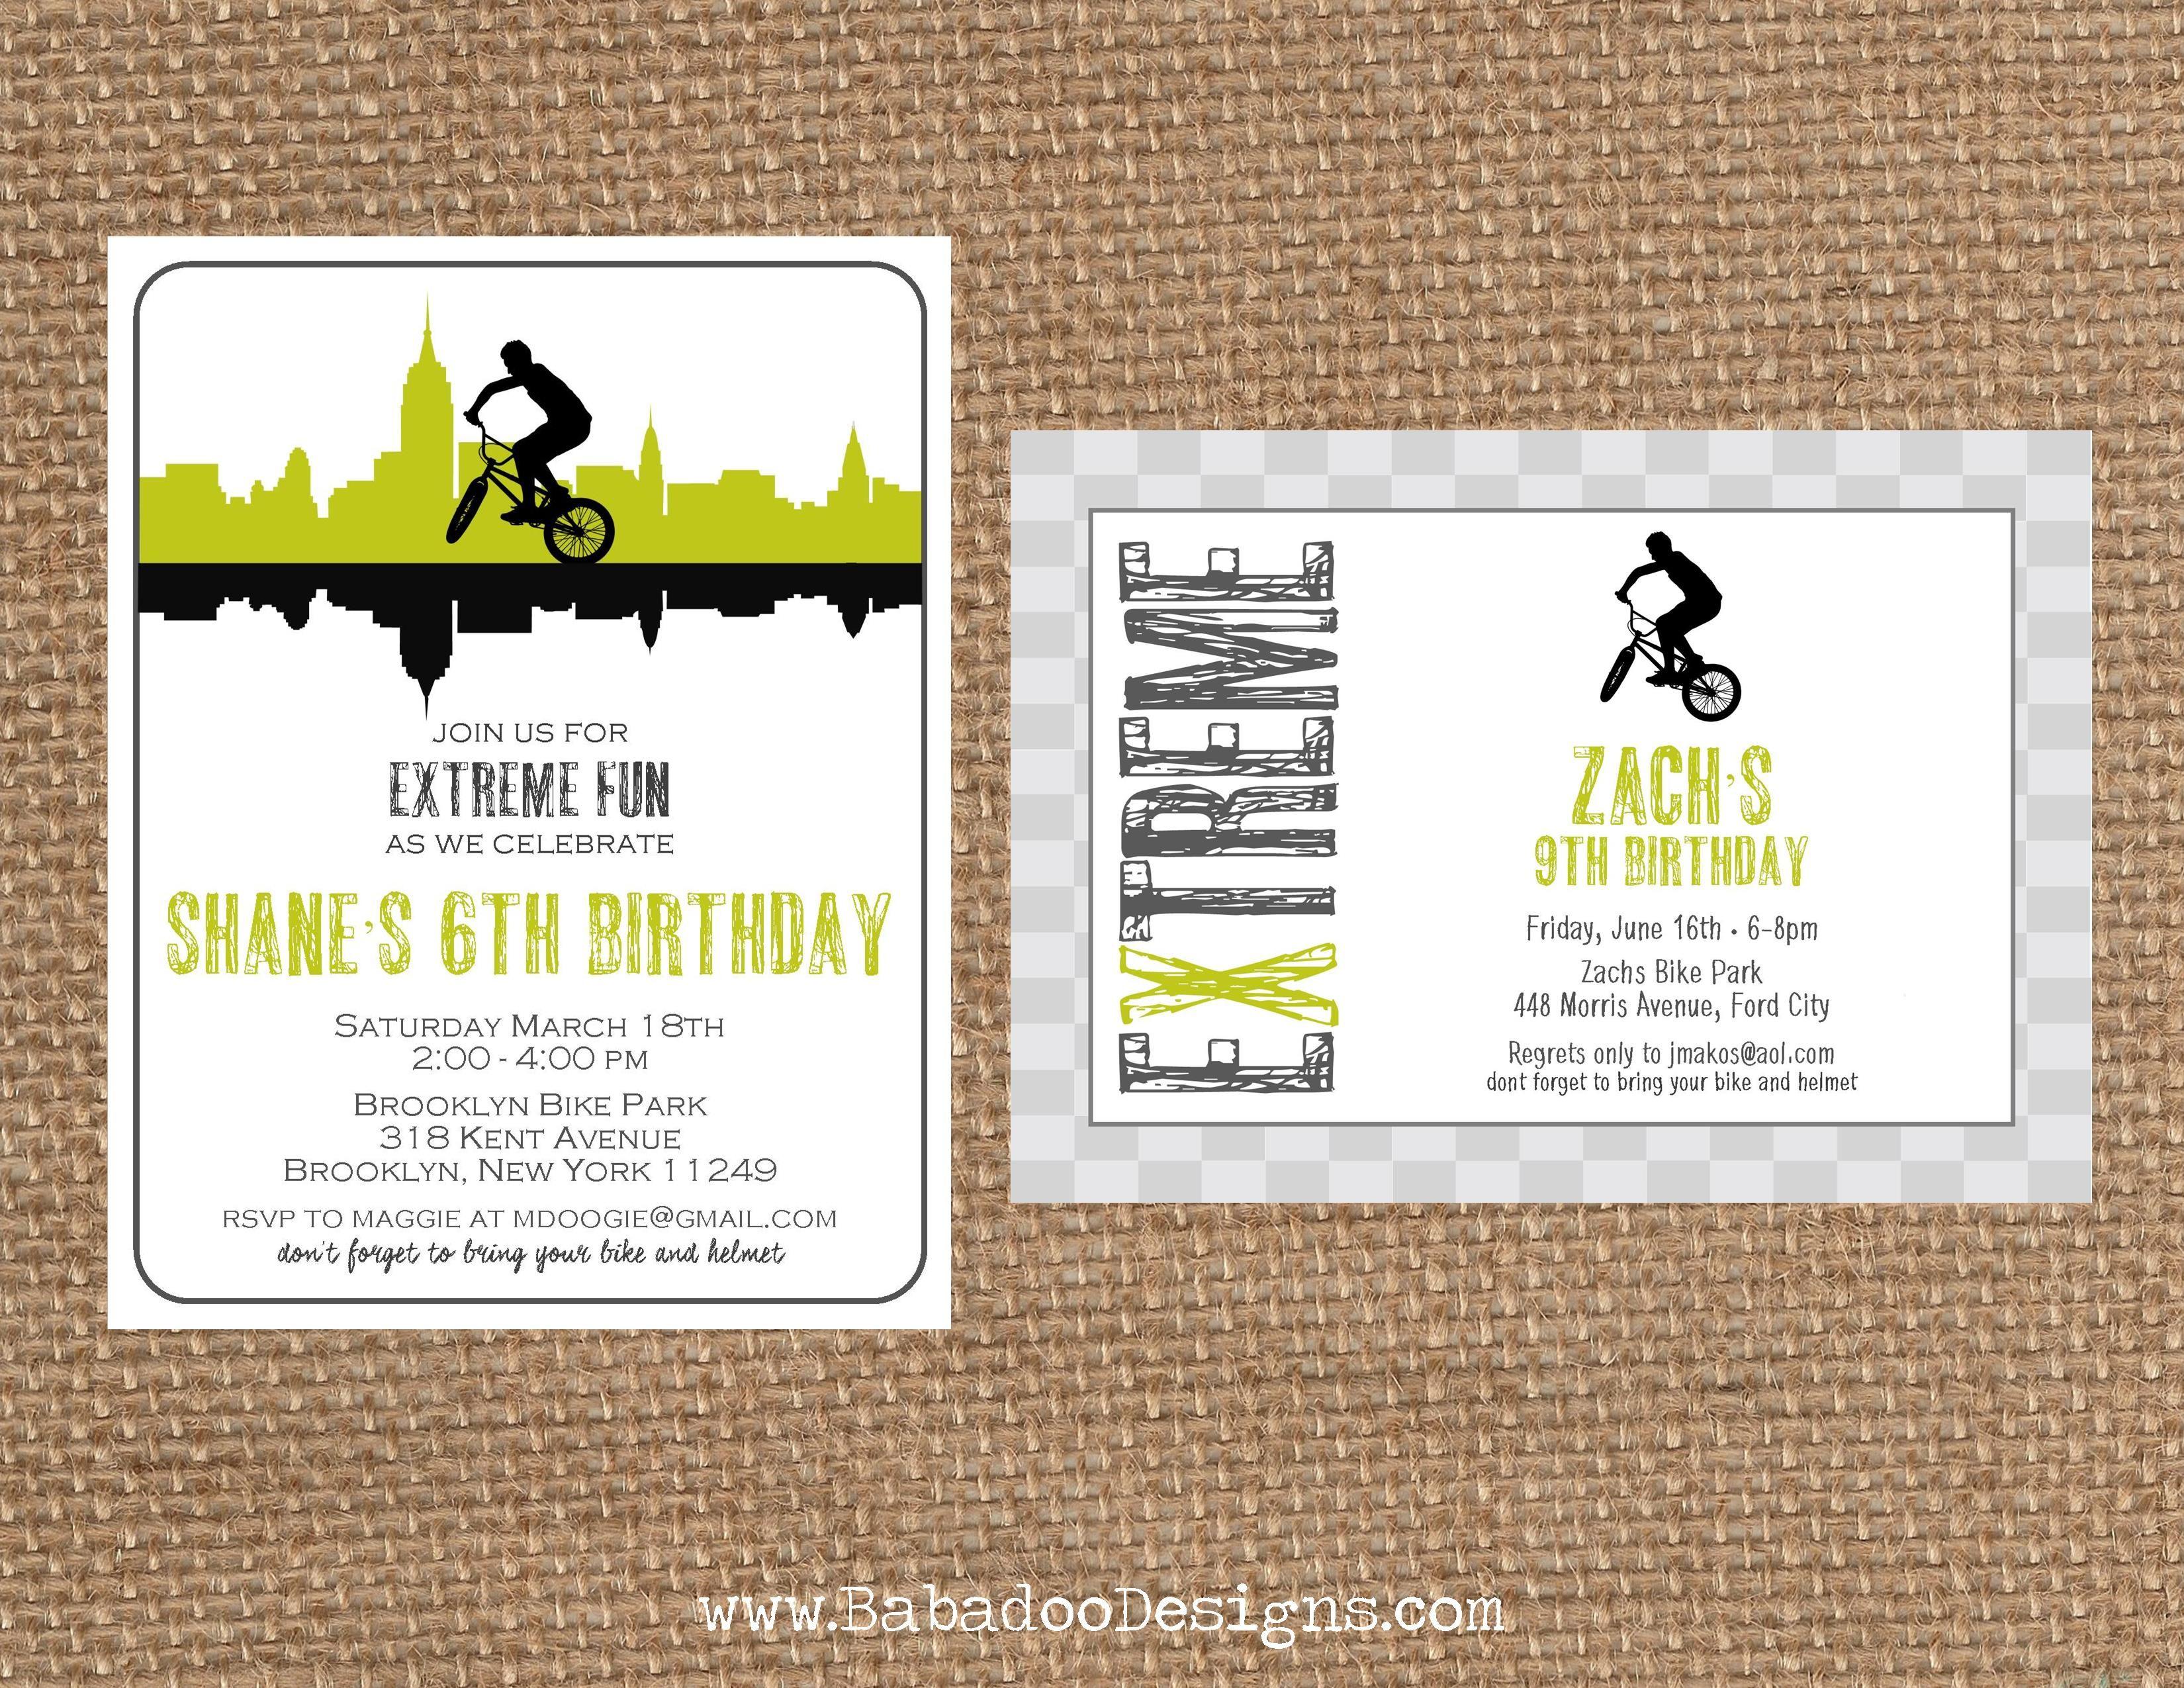 BMX + BIKE + EXTREME + Dirt // Birthday + Baby Shower + Bachlor ...